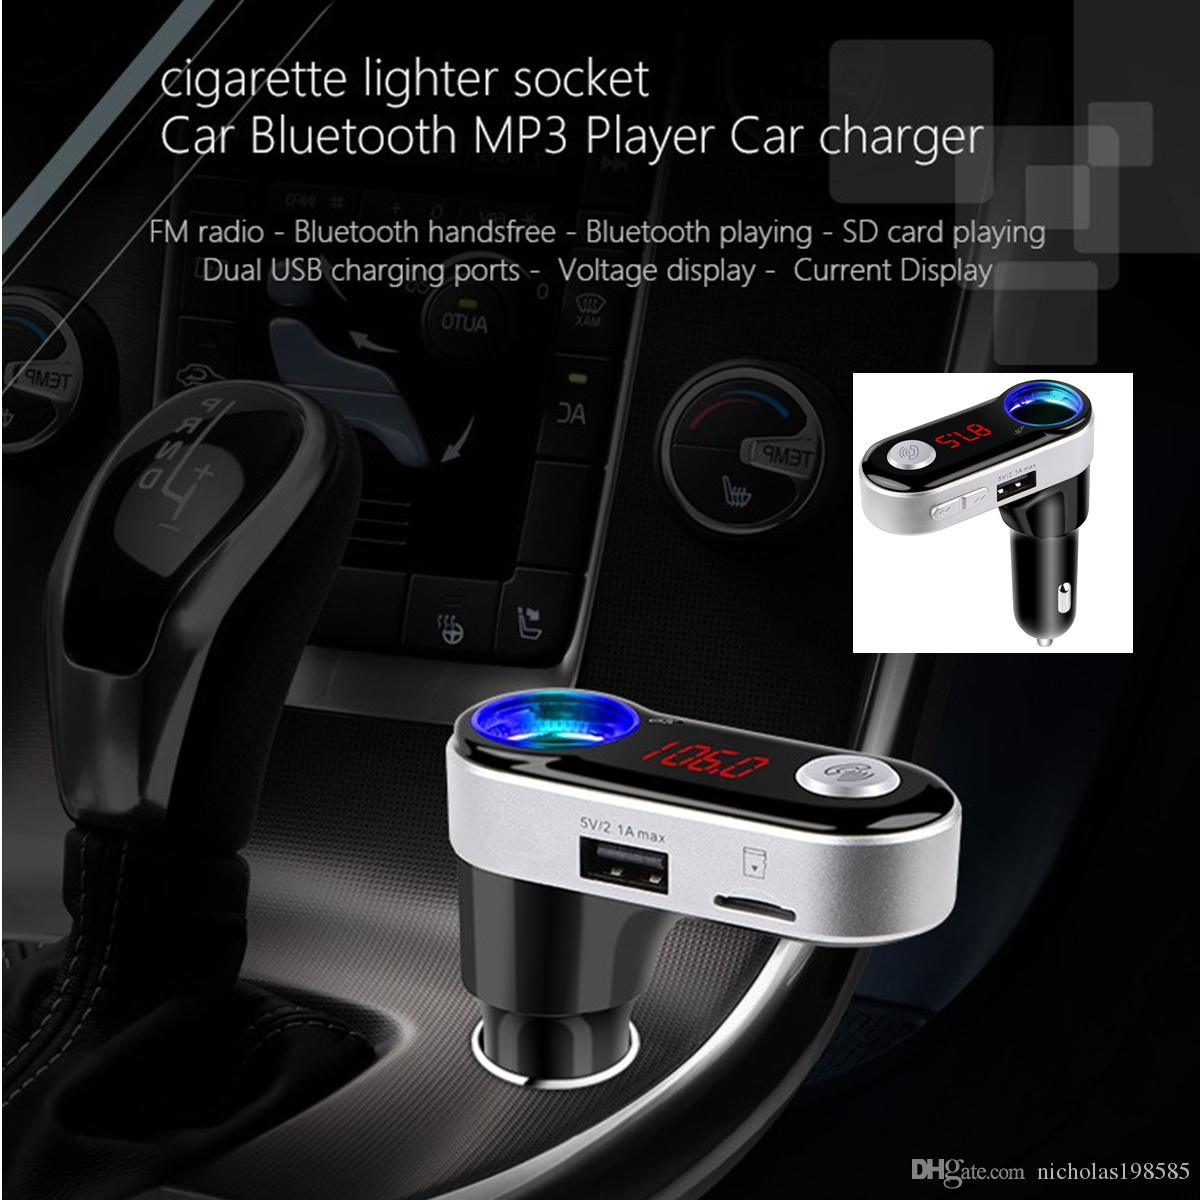 2019 bc09b dual usb car charger bluetooth car kit fm. Black Bedroom Furniture Sets. Home Design Ideas